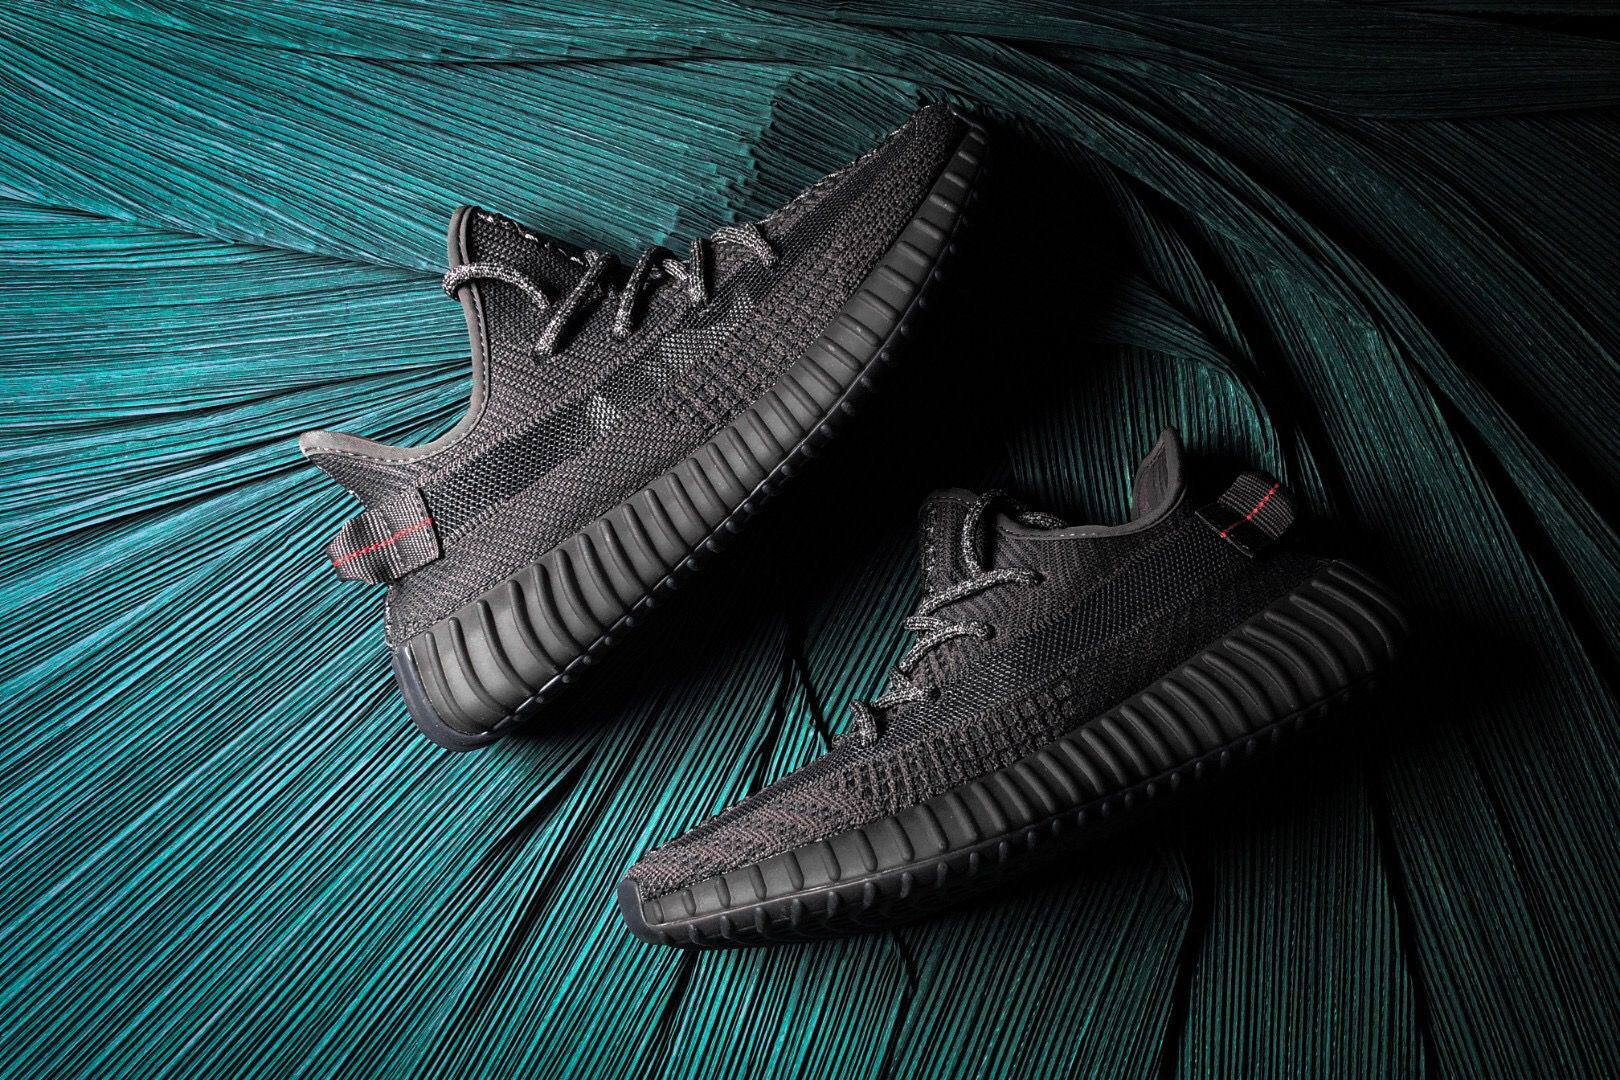 Adidas Yeezy Boost 350 V2 Black Reflective FU9007 | Yeezy